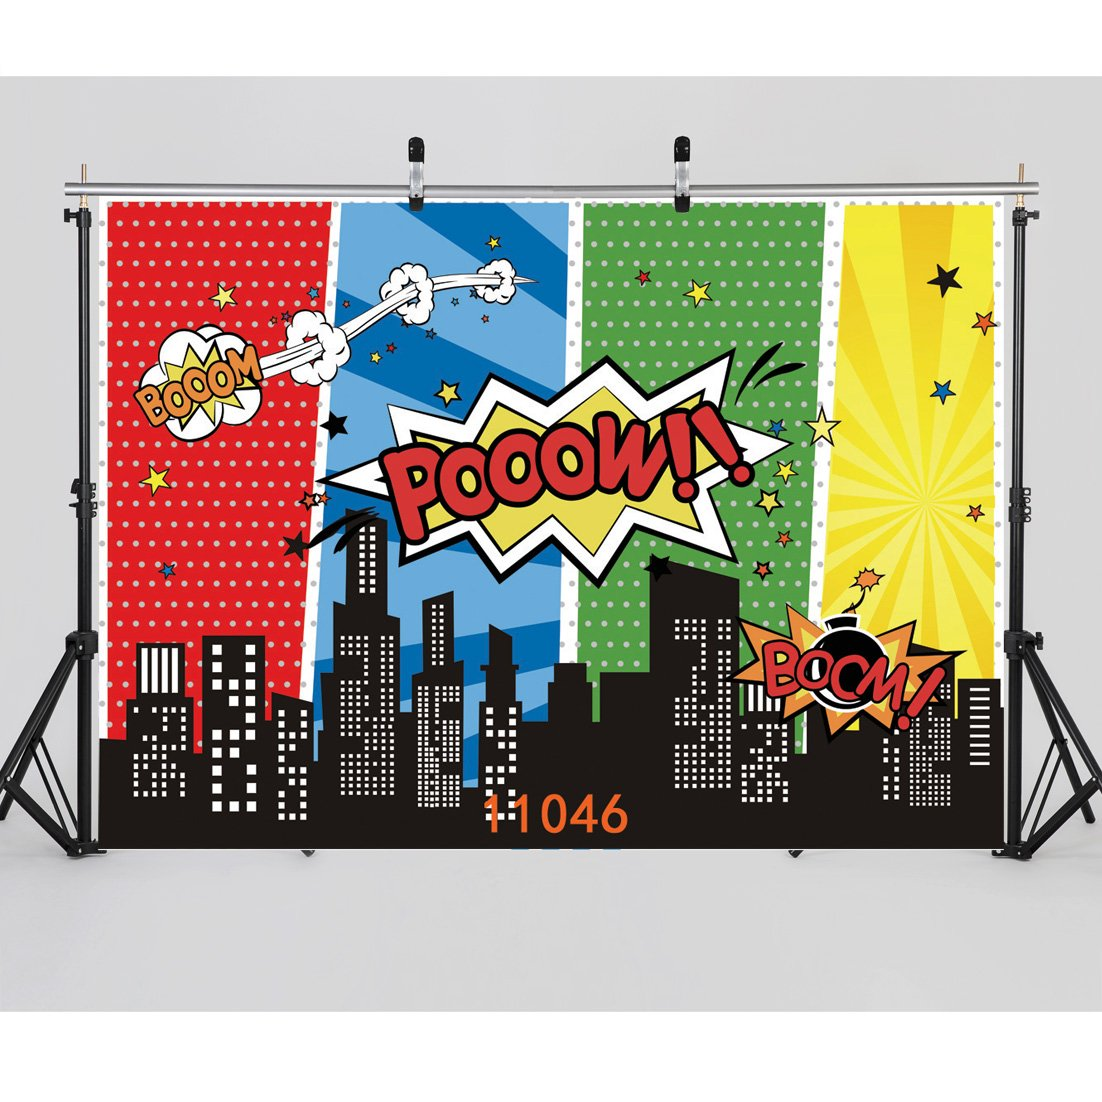 WOLADA 7x5ft Superhero Backdrops Vinyl Super City Photo Backgrounds Photography Birthday Party for Children 11046